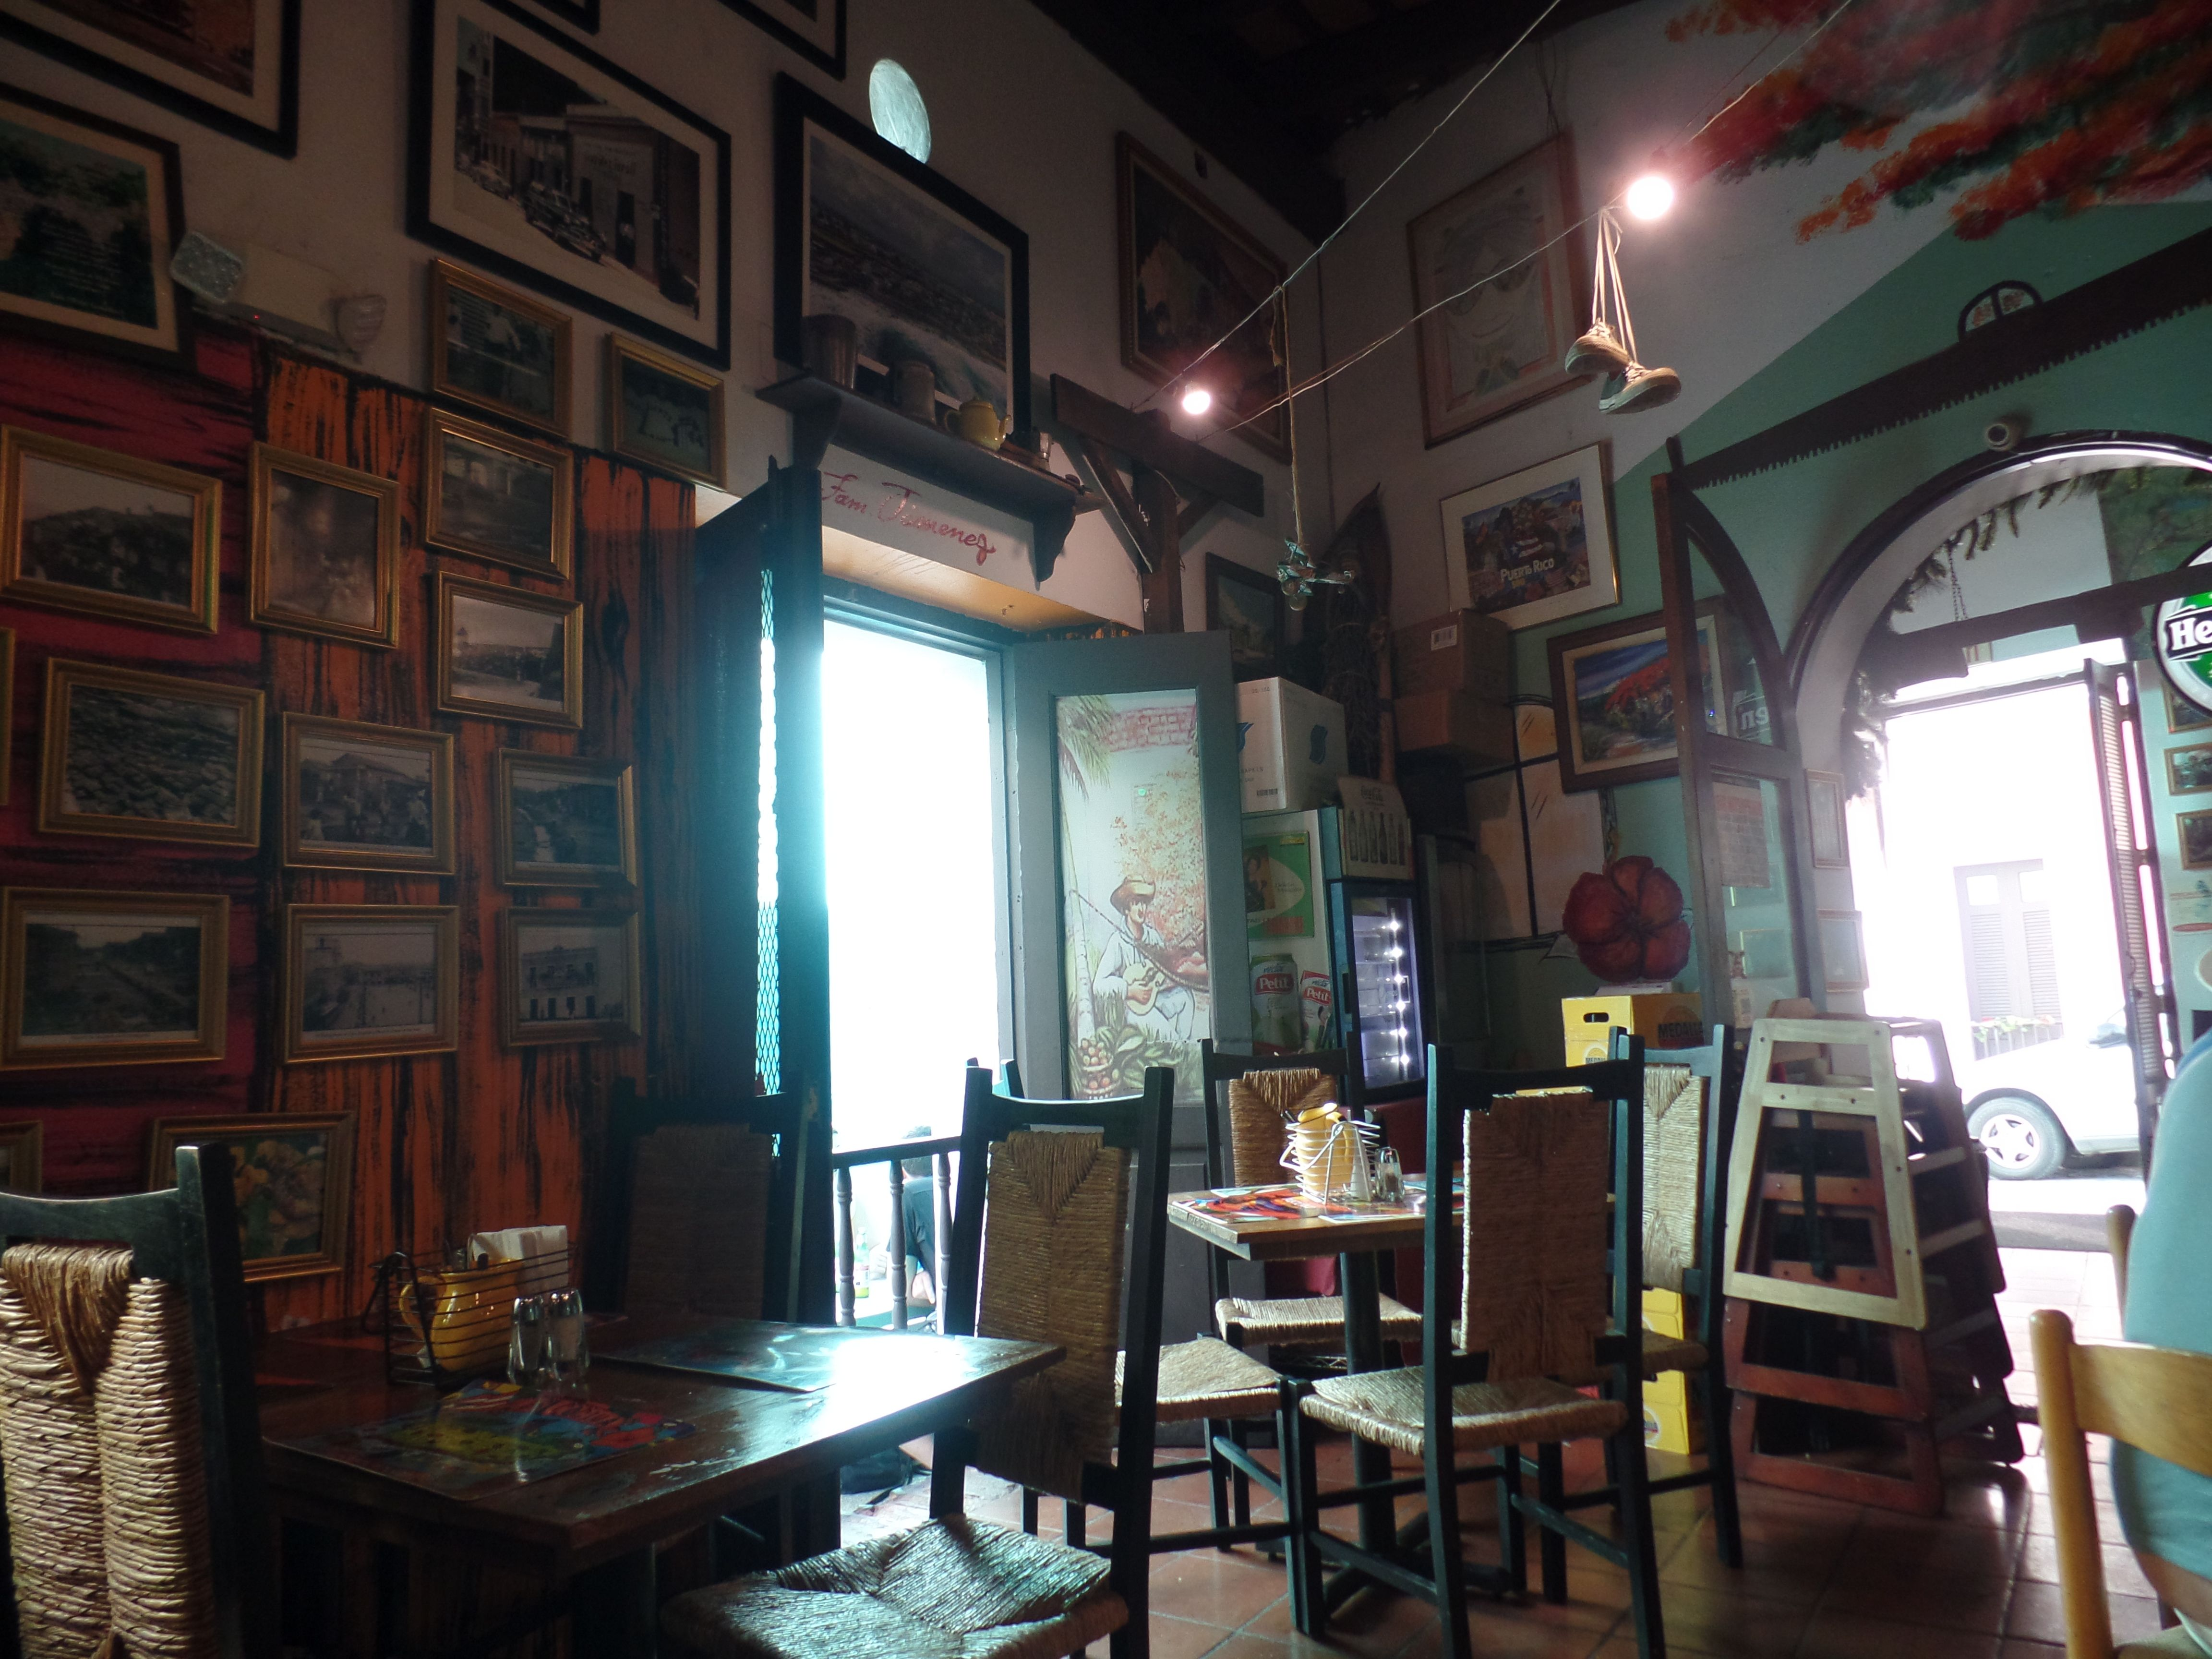 palmas restaurant old san juan, puerto rico | vacation 2015